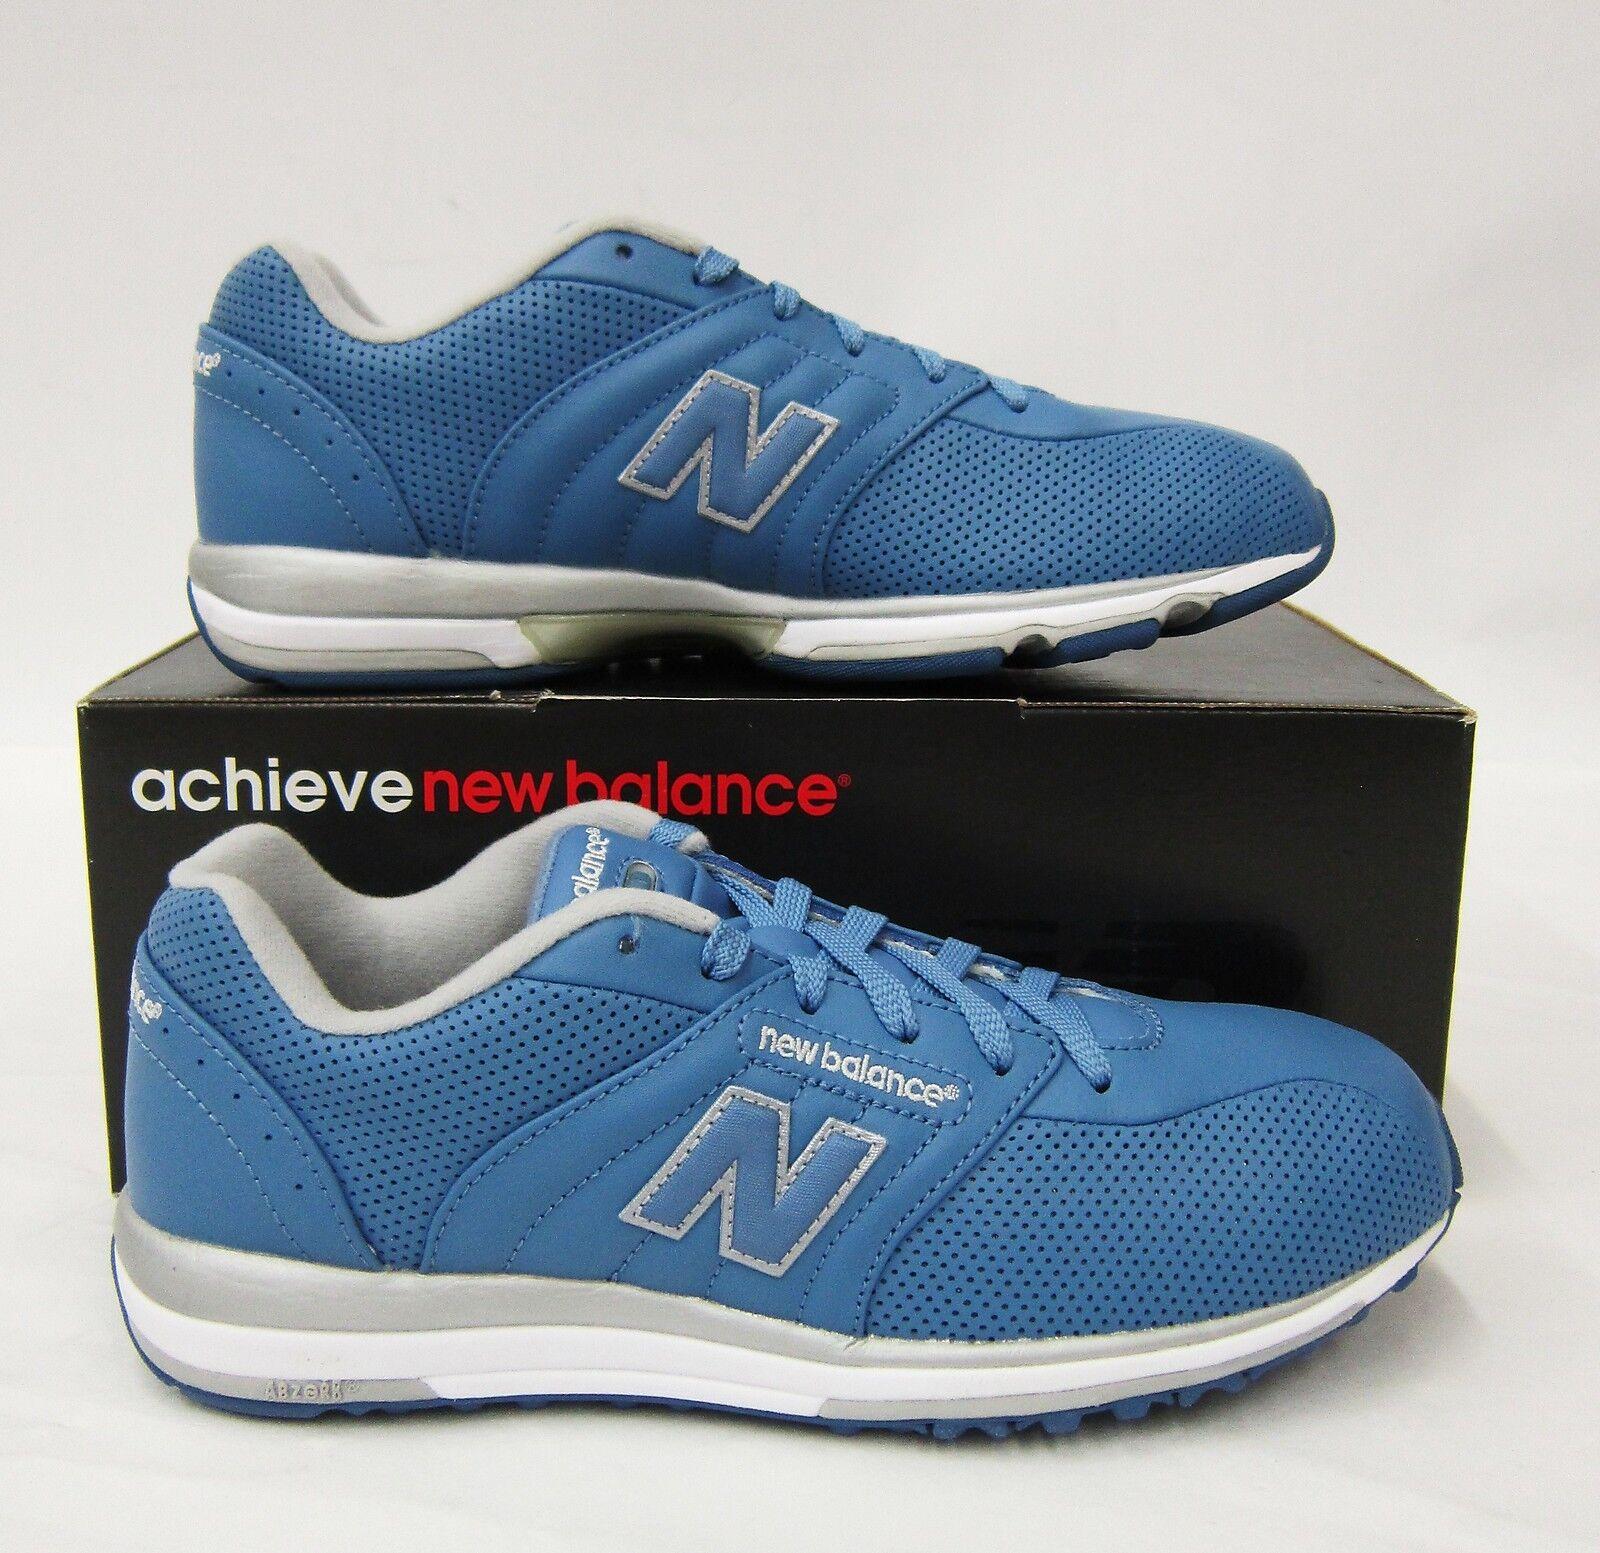 NEW Balance Sneaker Scarpa Blu/Argento #5001